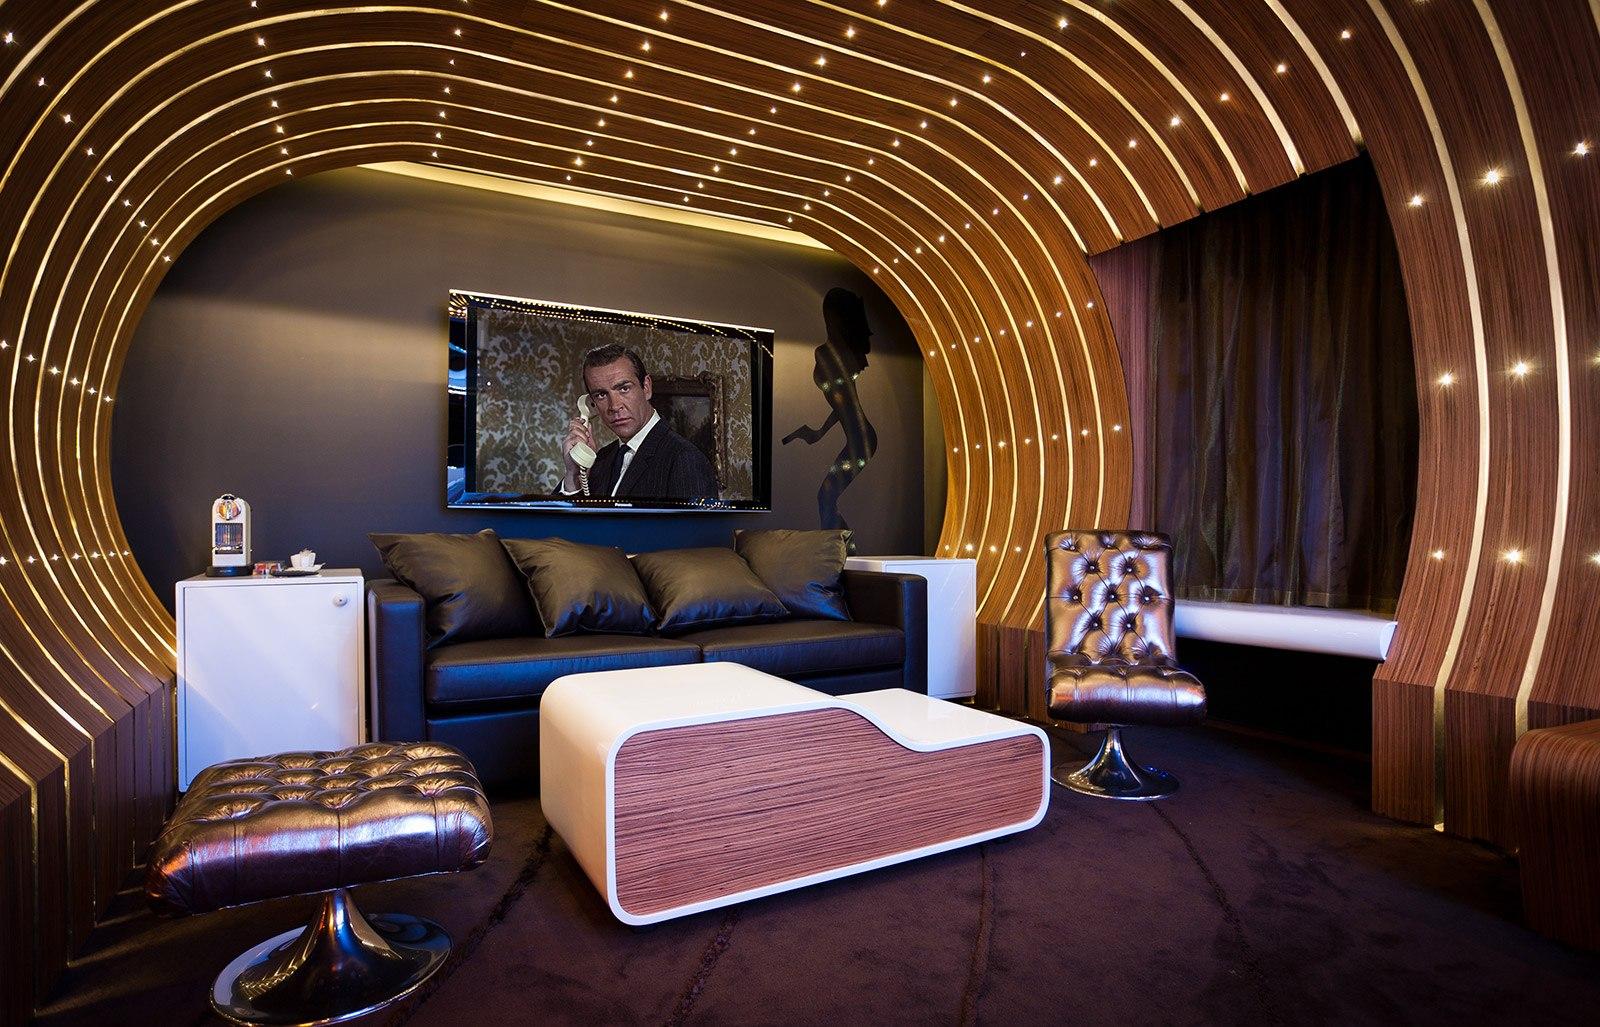 James Bond Themed Hotel Room In Paris